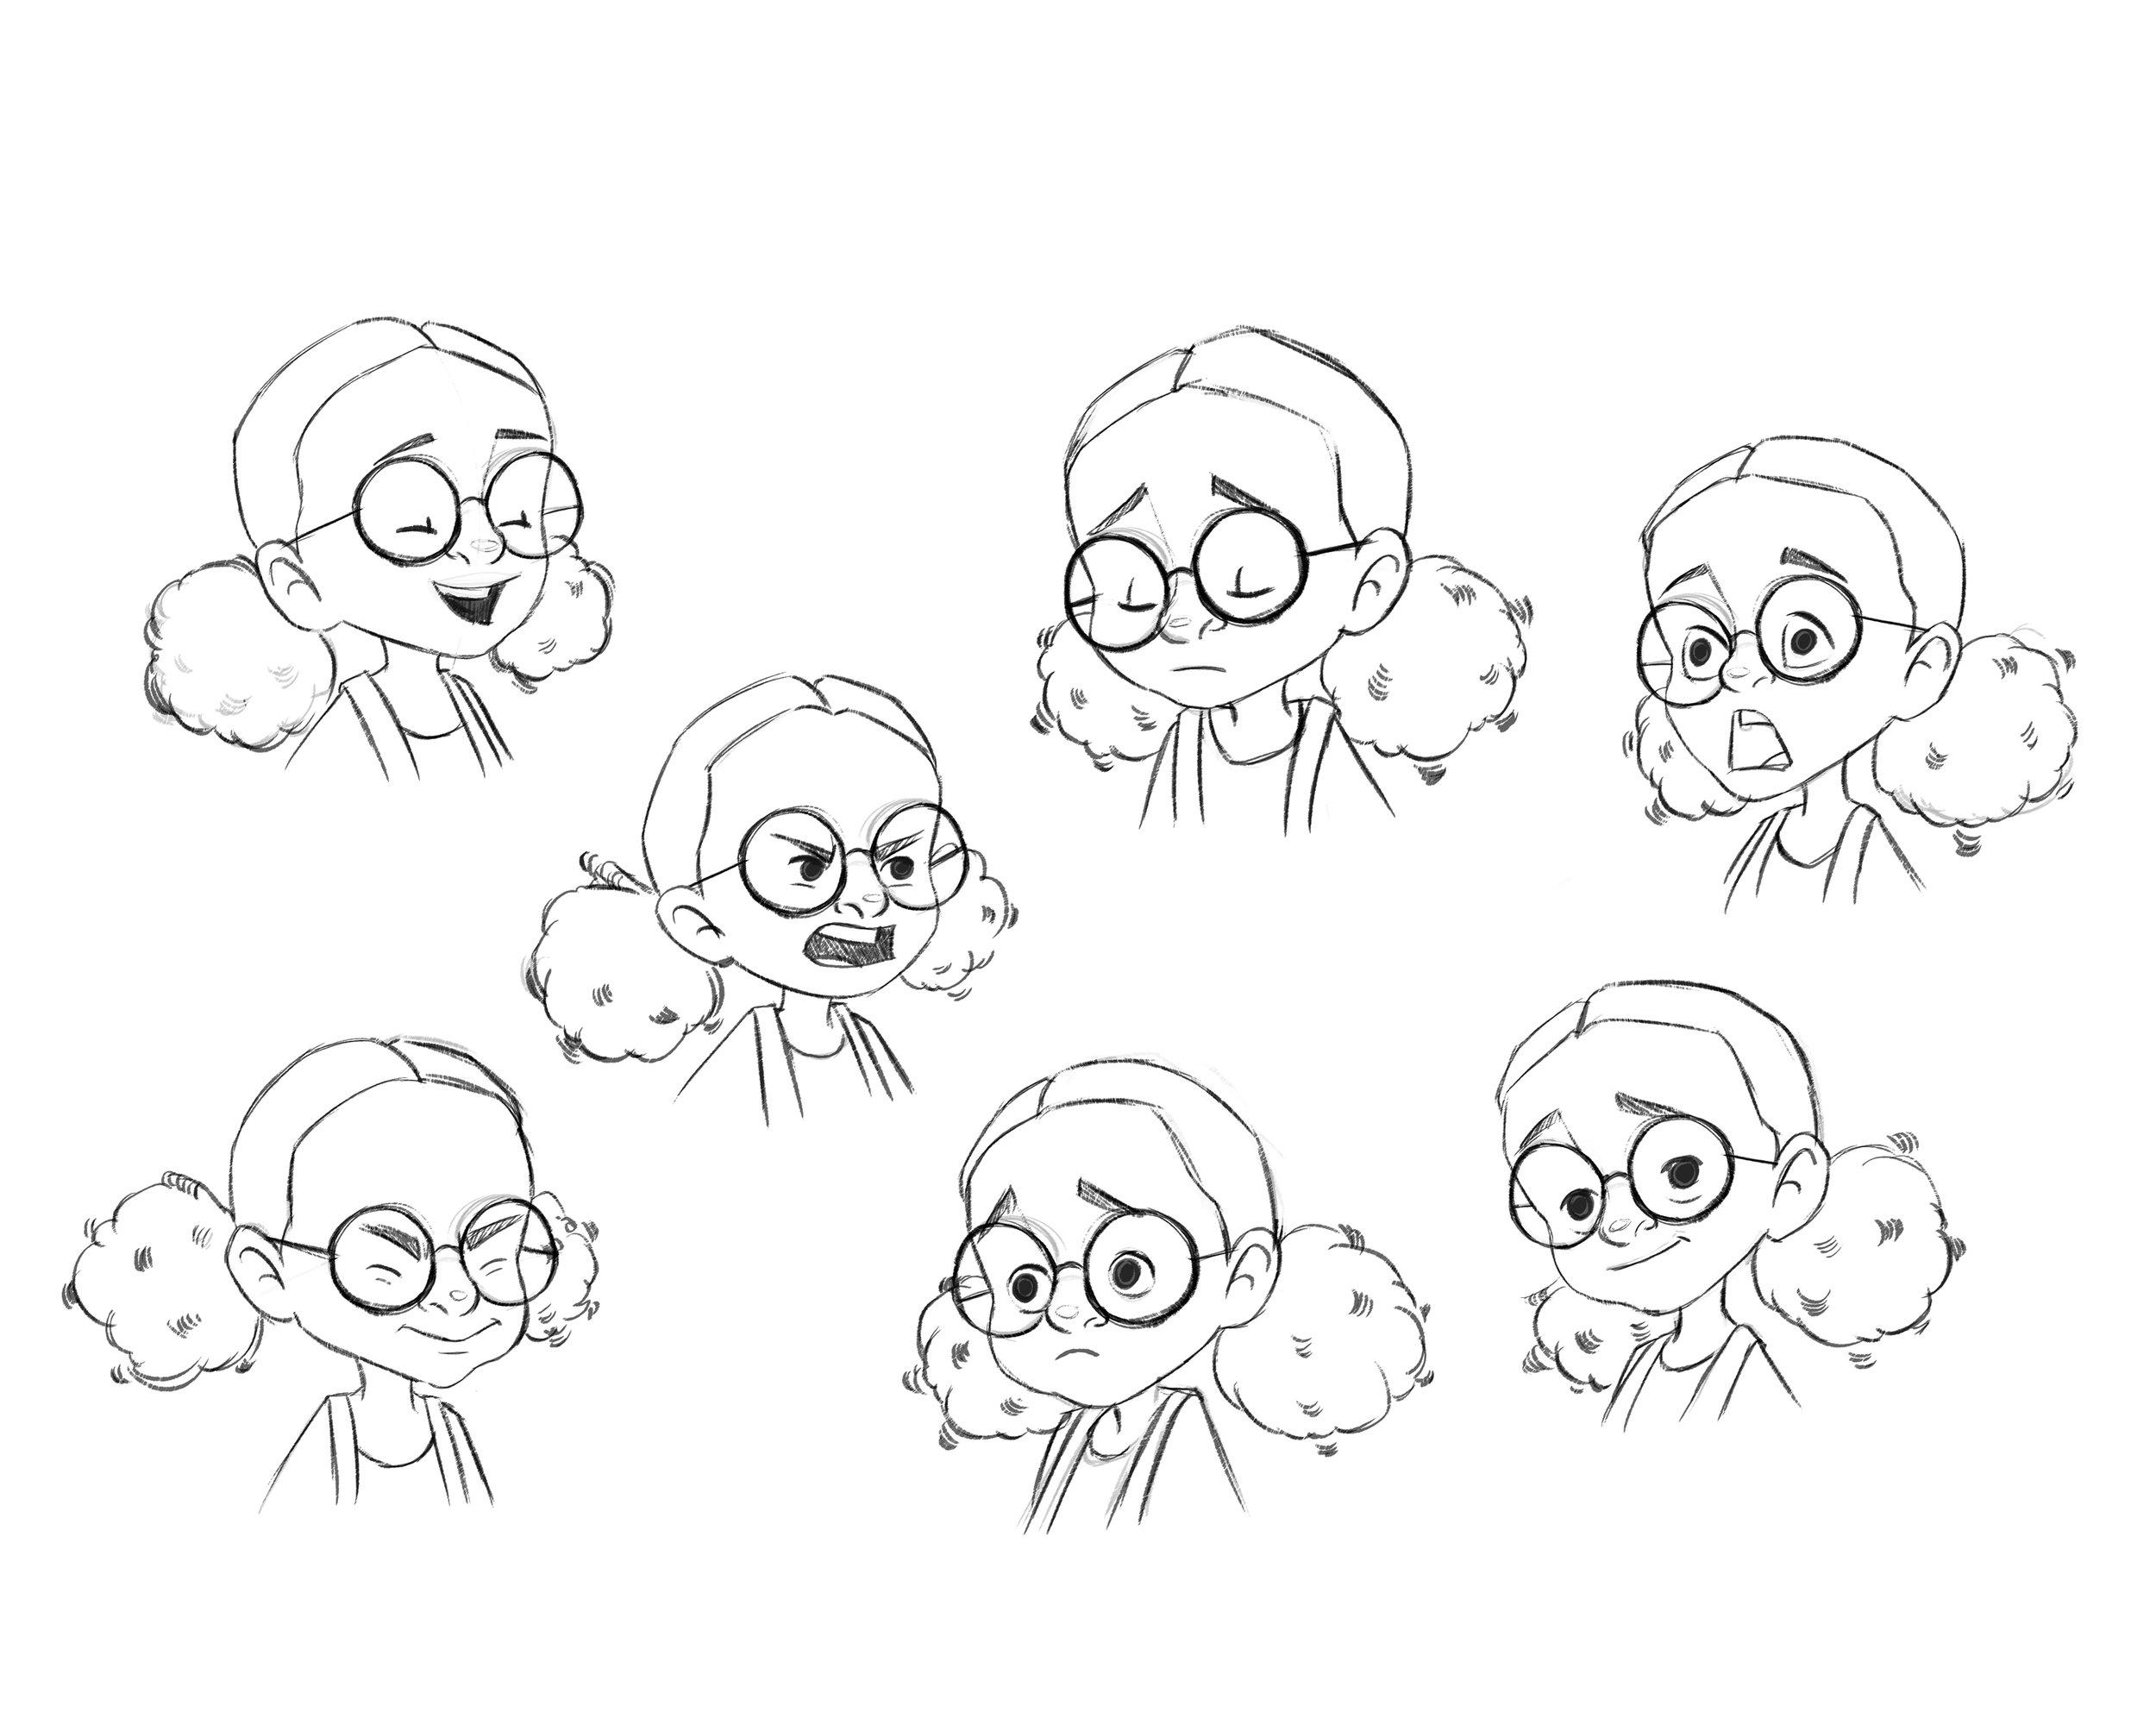 Billie_expressions.jpg